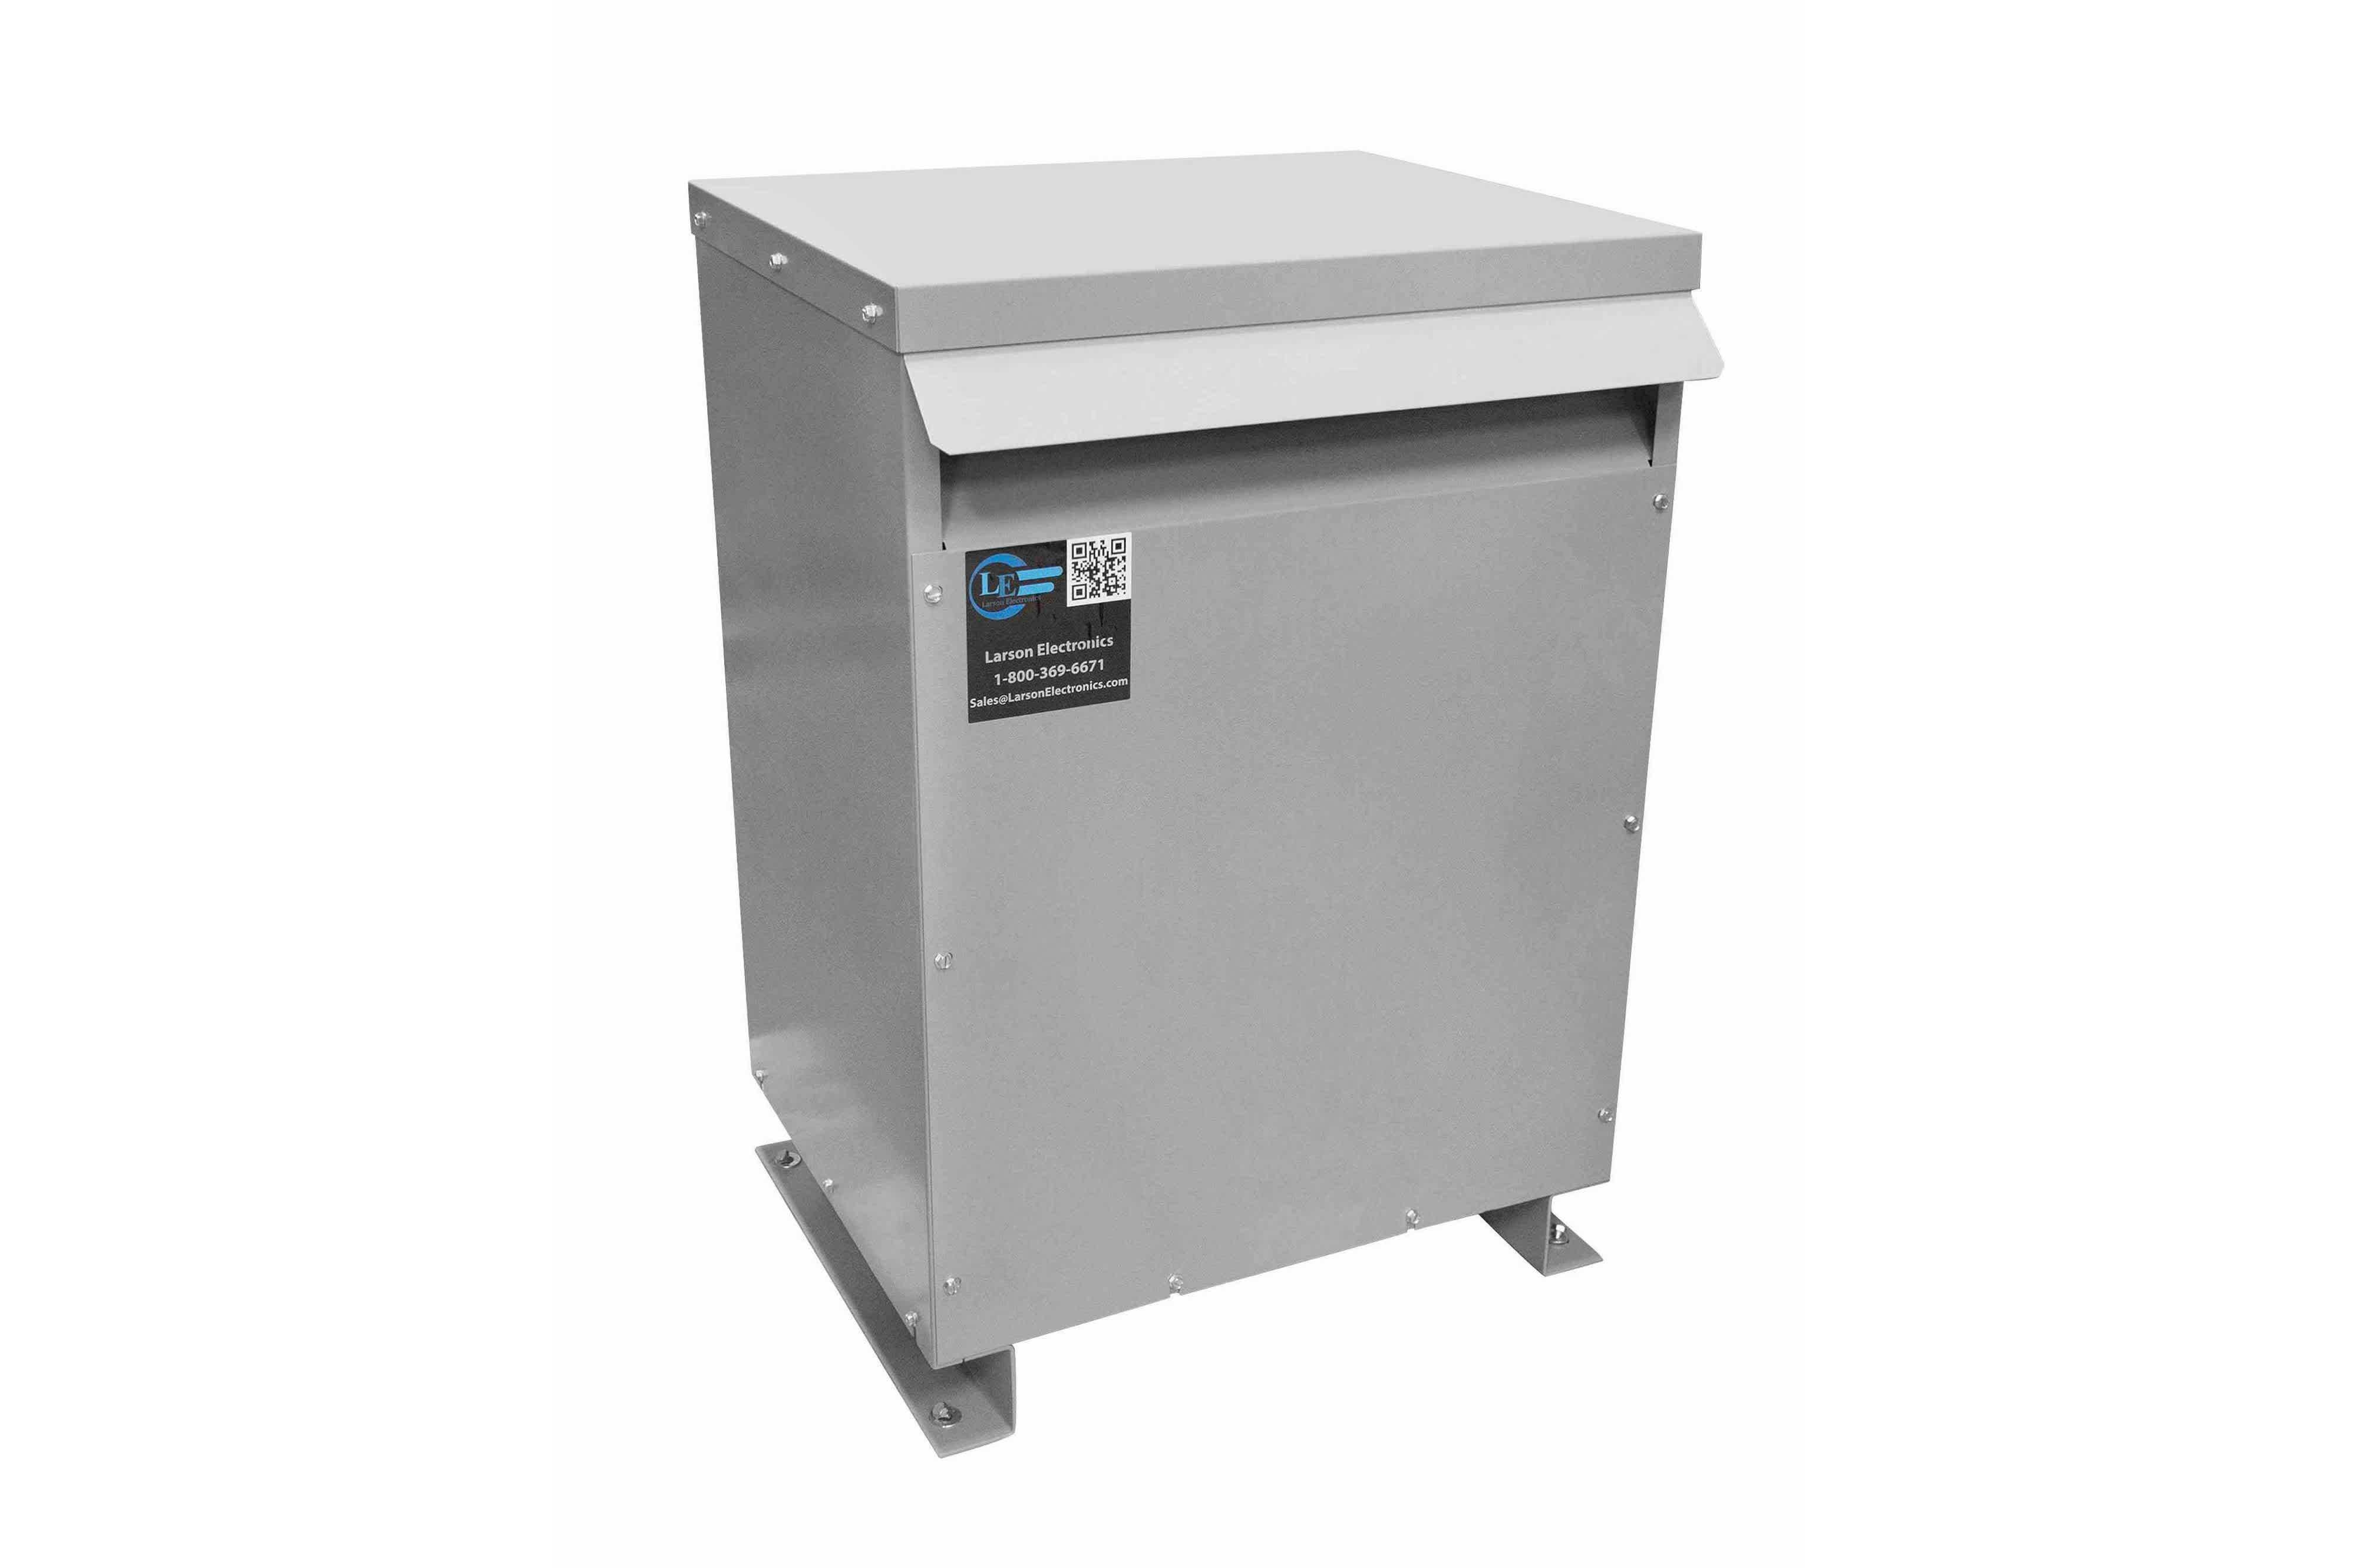 600 kVA 3PH Isolation Transformer, 575V Wye Primary, 480V Delta Secondary, N3R, Ventilated, 60 Hz